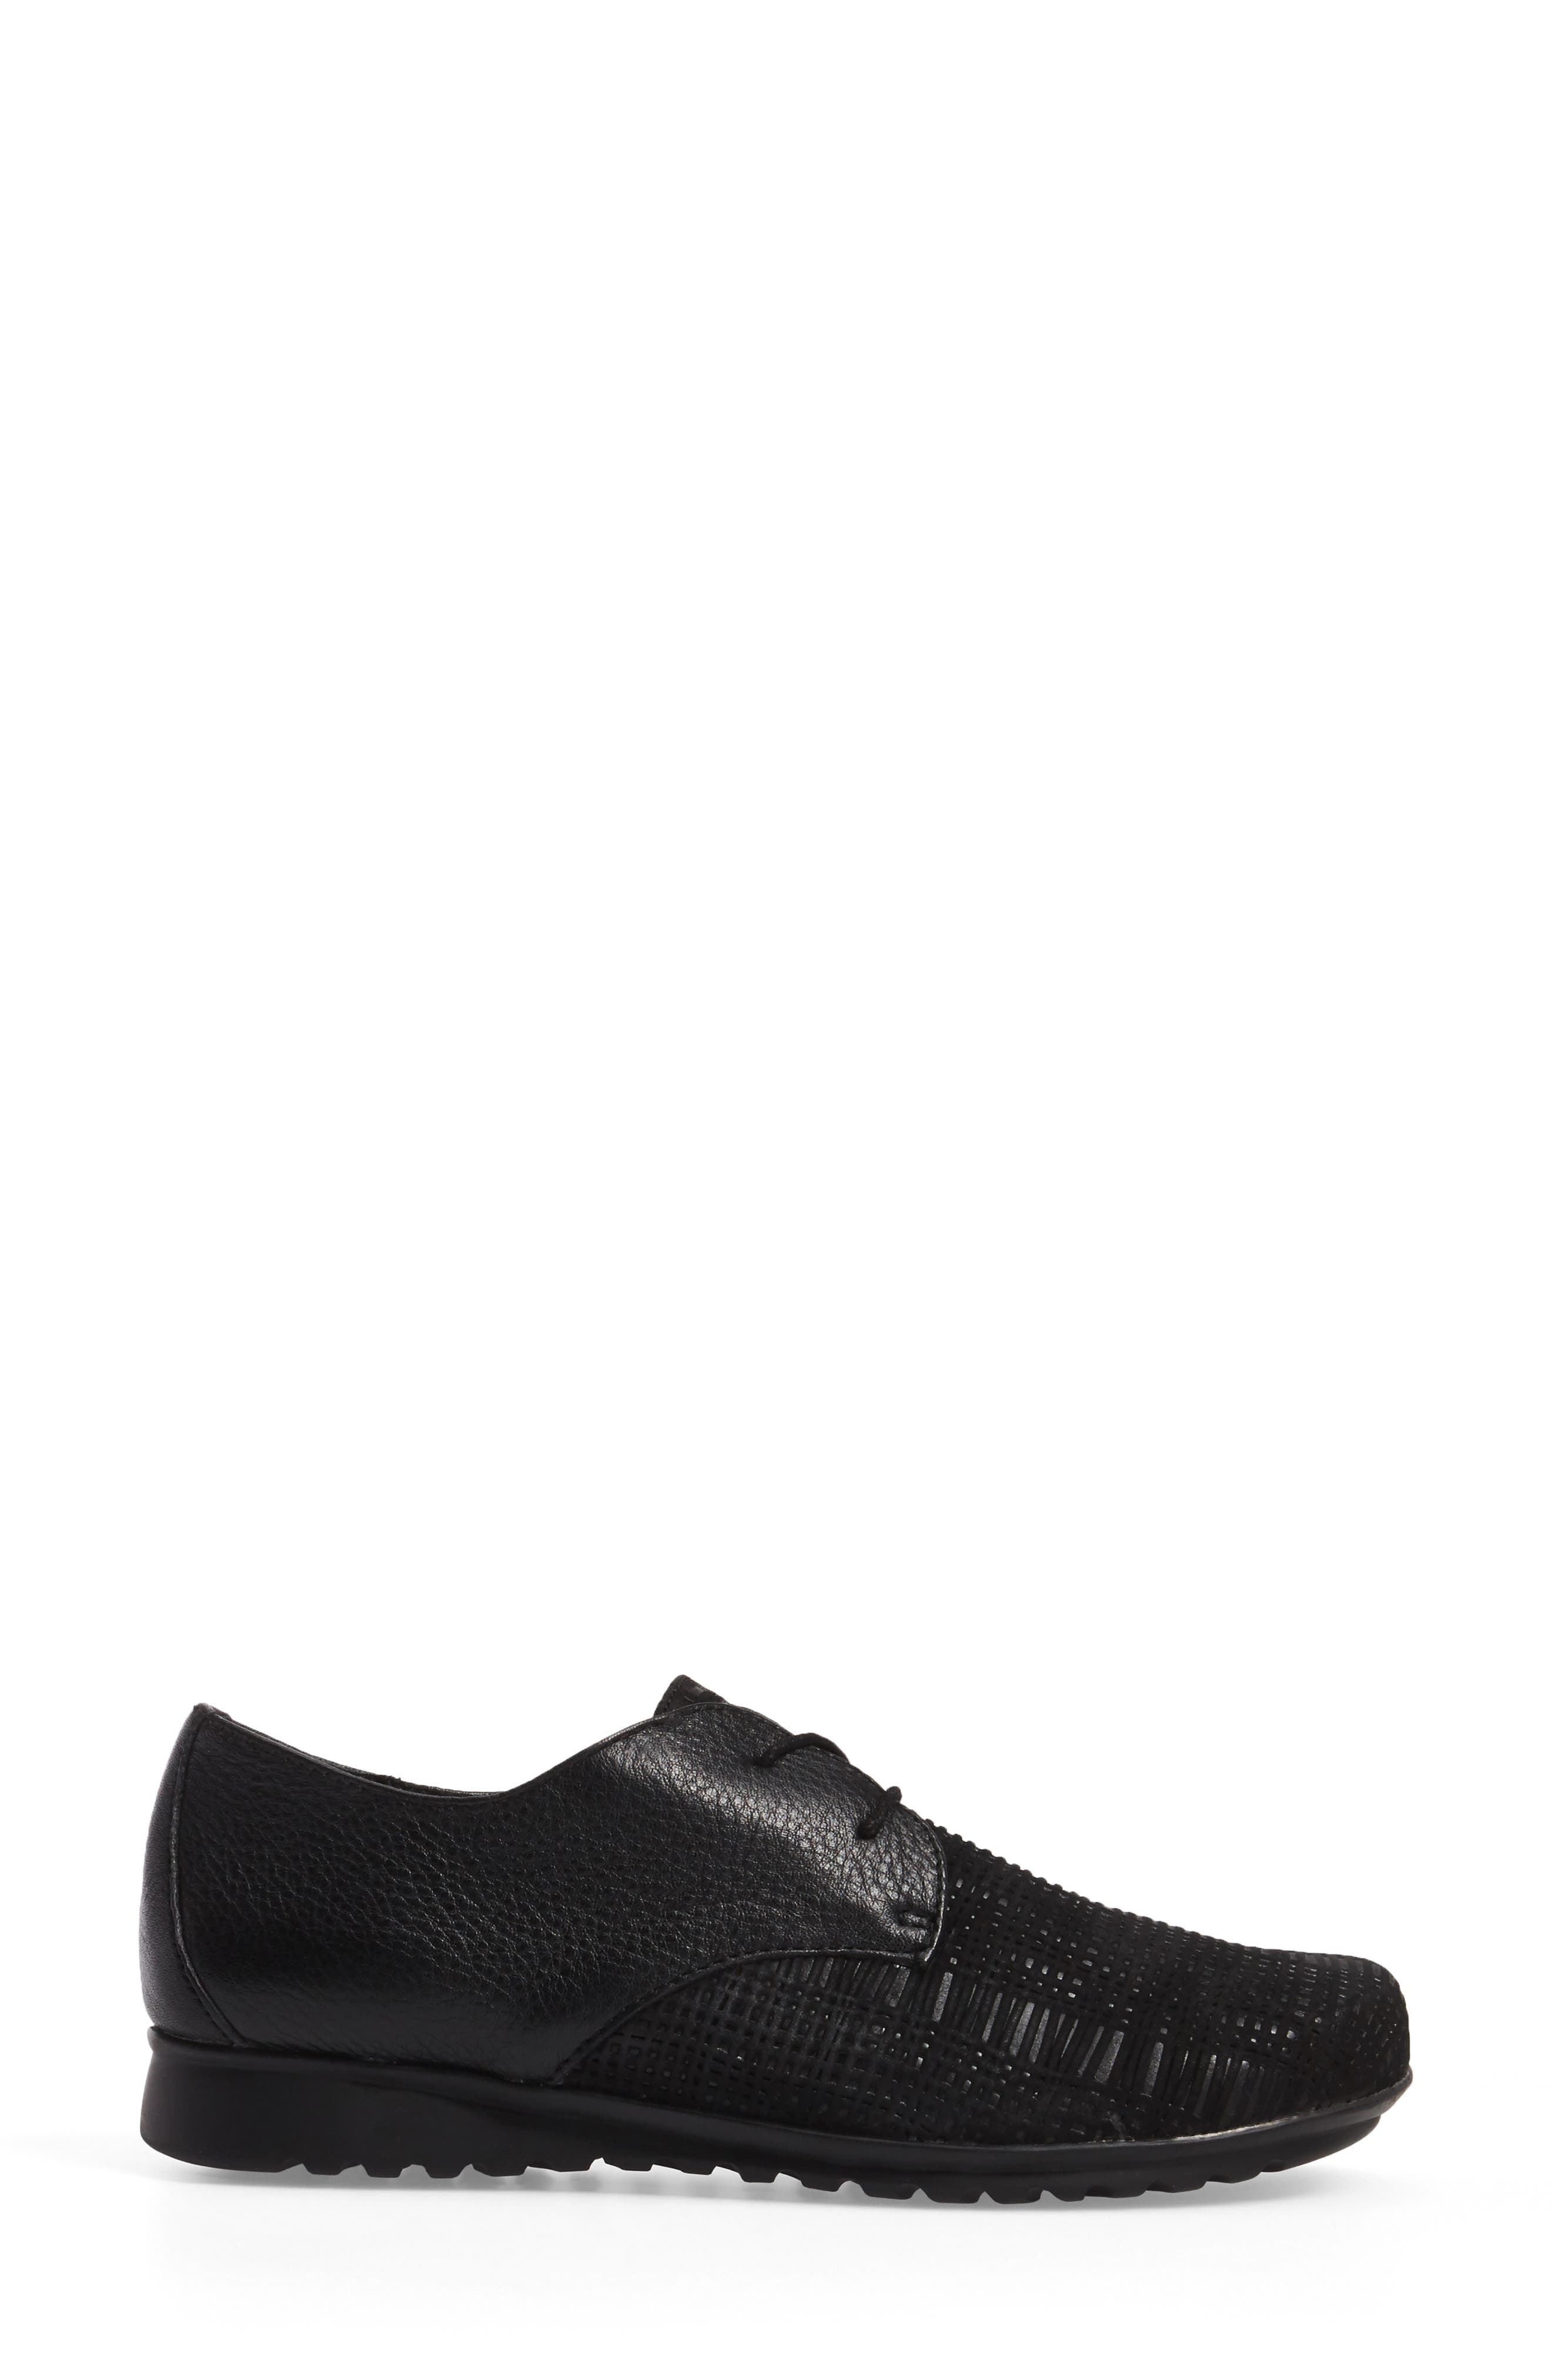 Alternate Image 3  - Aetrex Erin Saddle Shoe (Women)